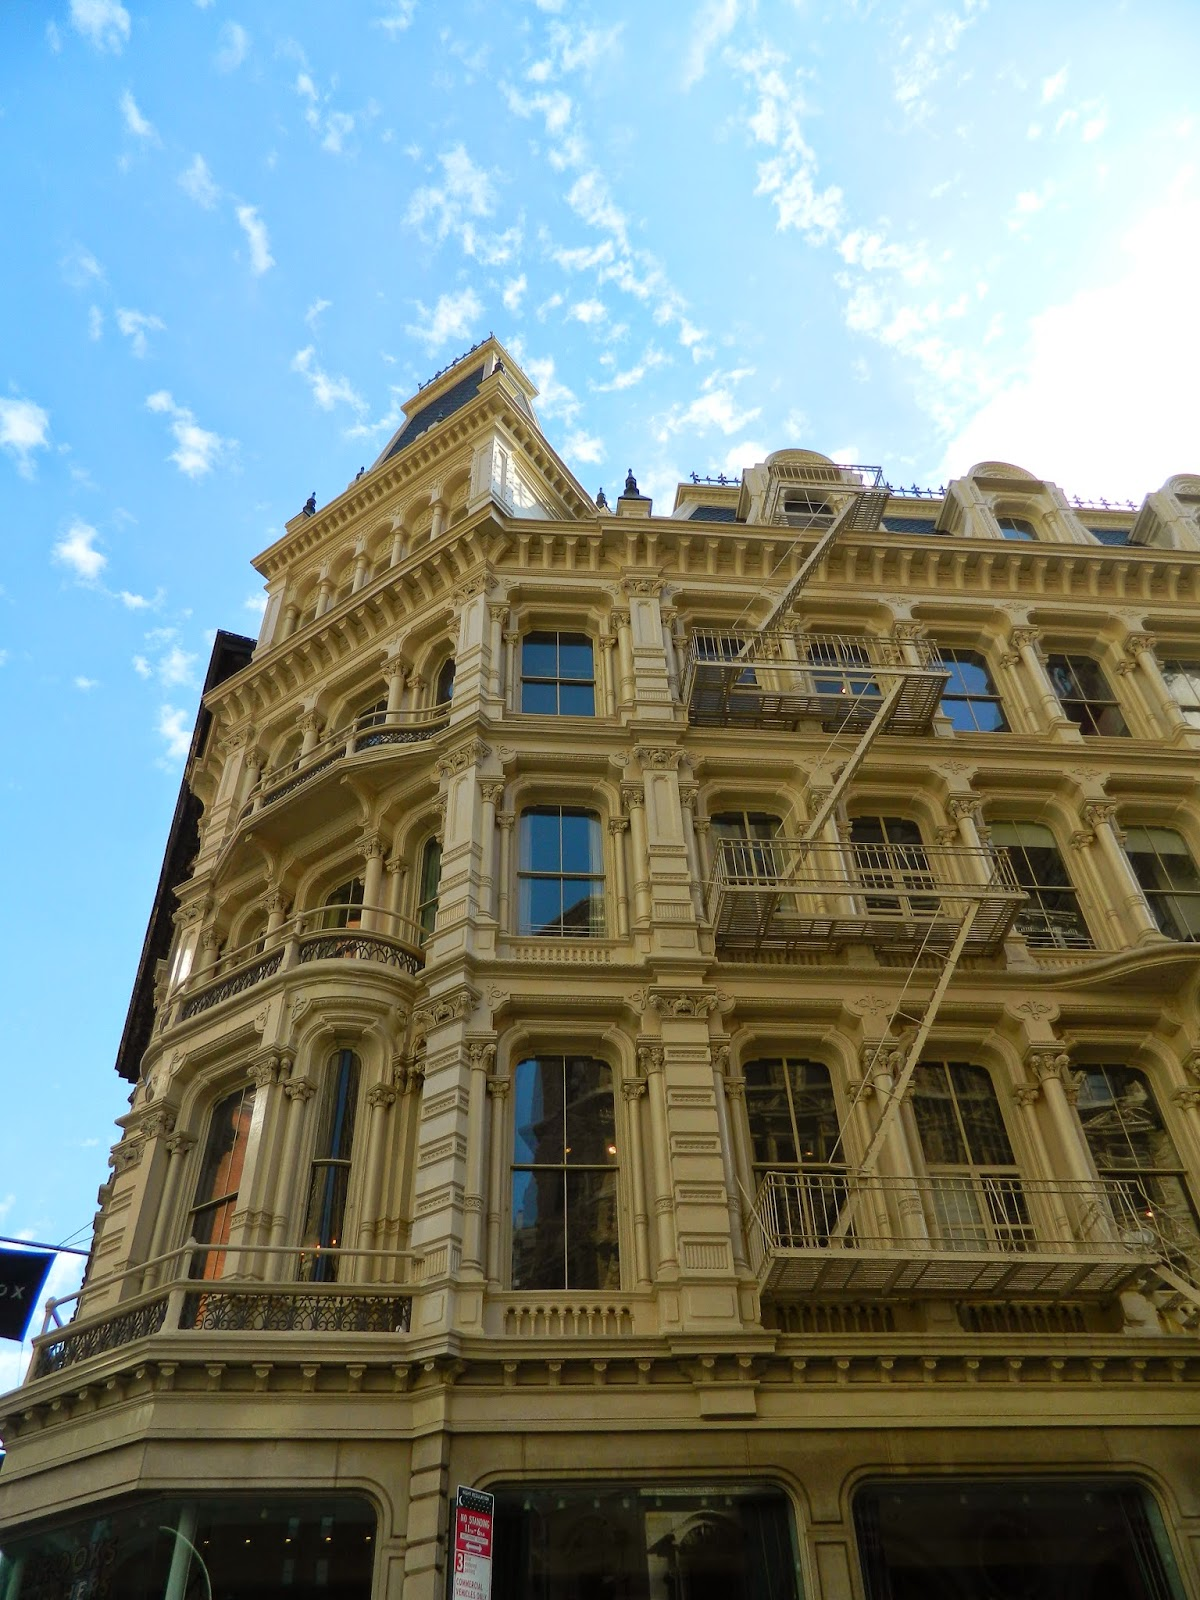 new york city architecture gold brown fire escape big windows summer